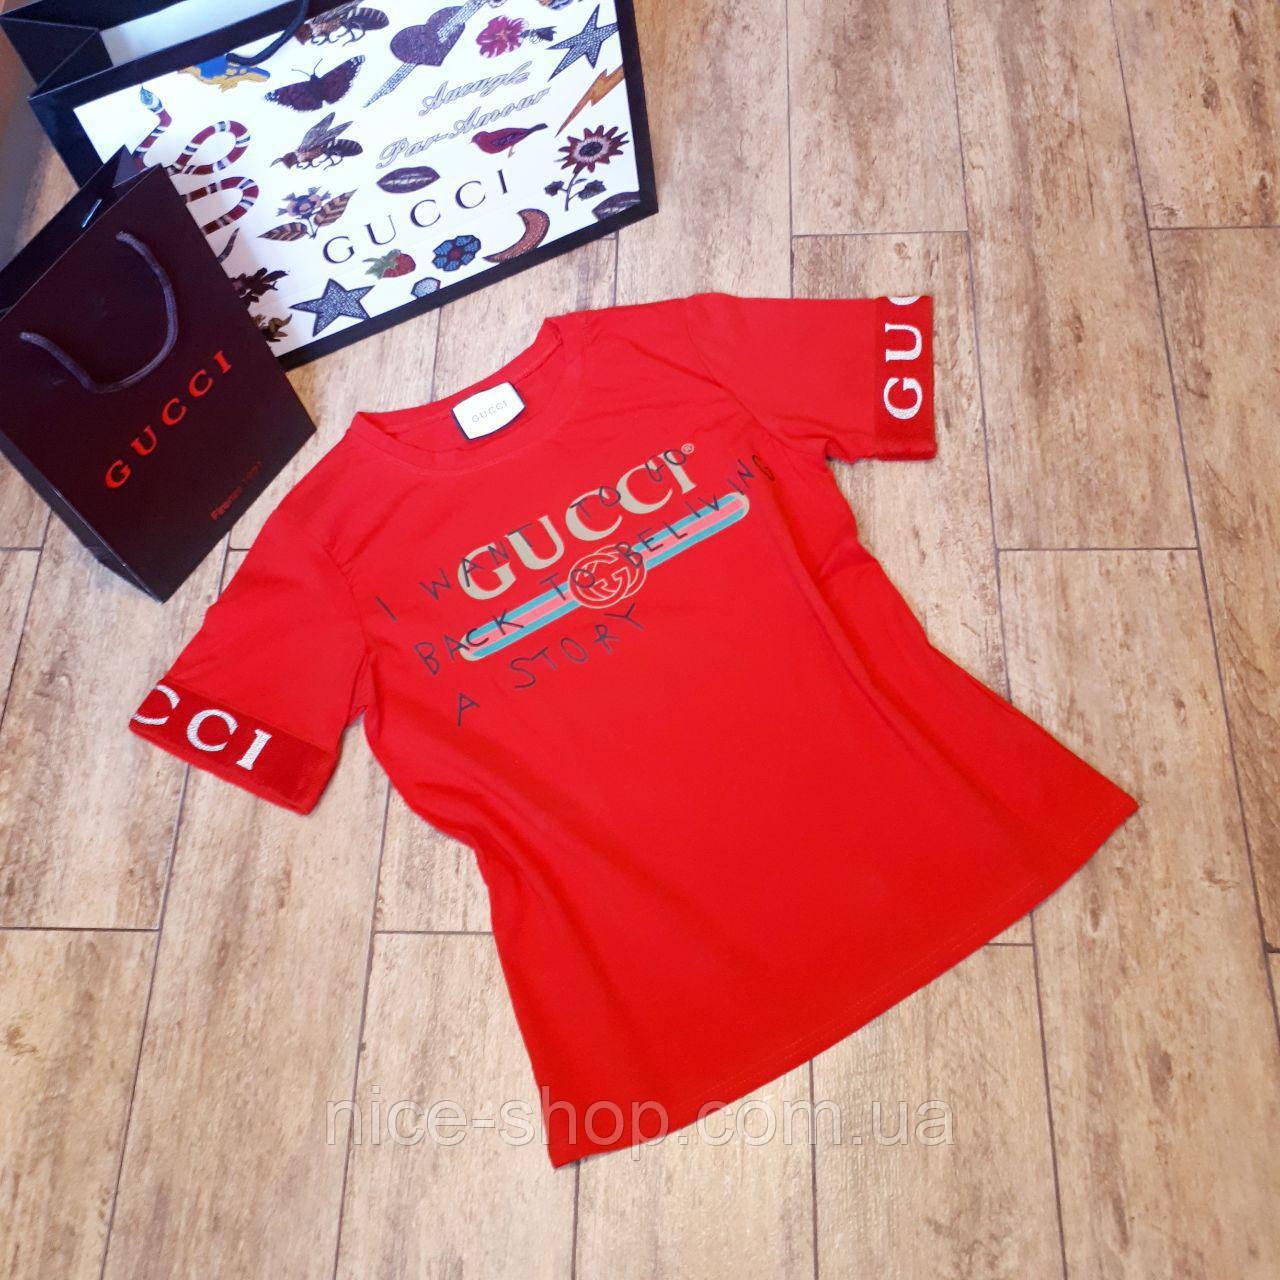 Футболка женская Gucci красная, рукав манжет